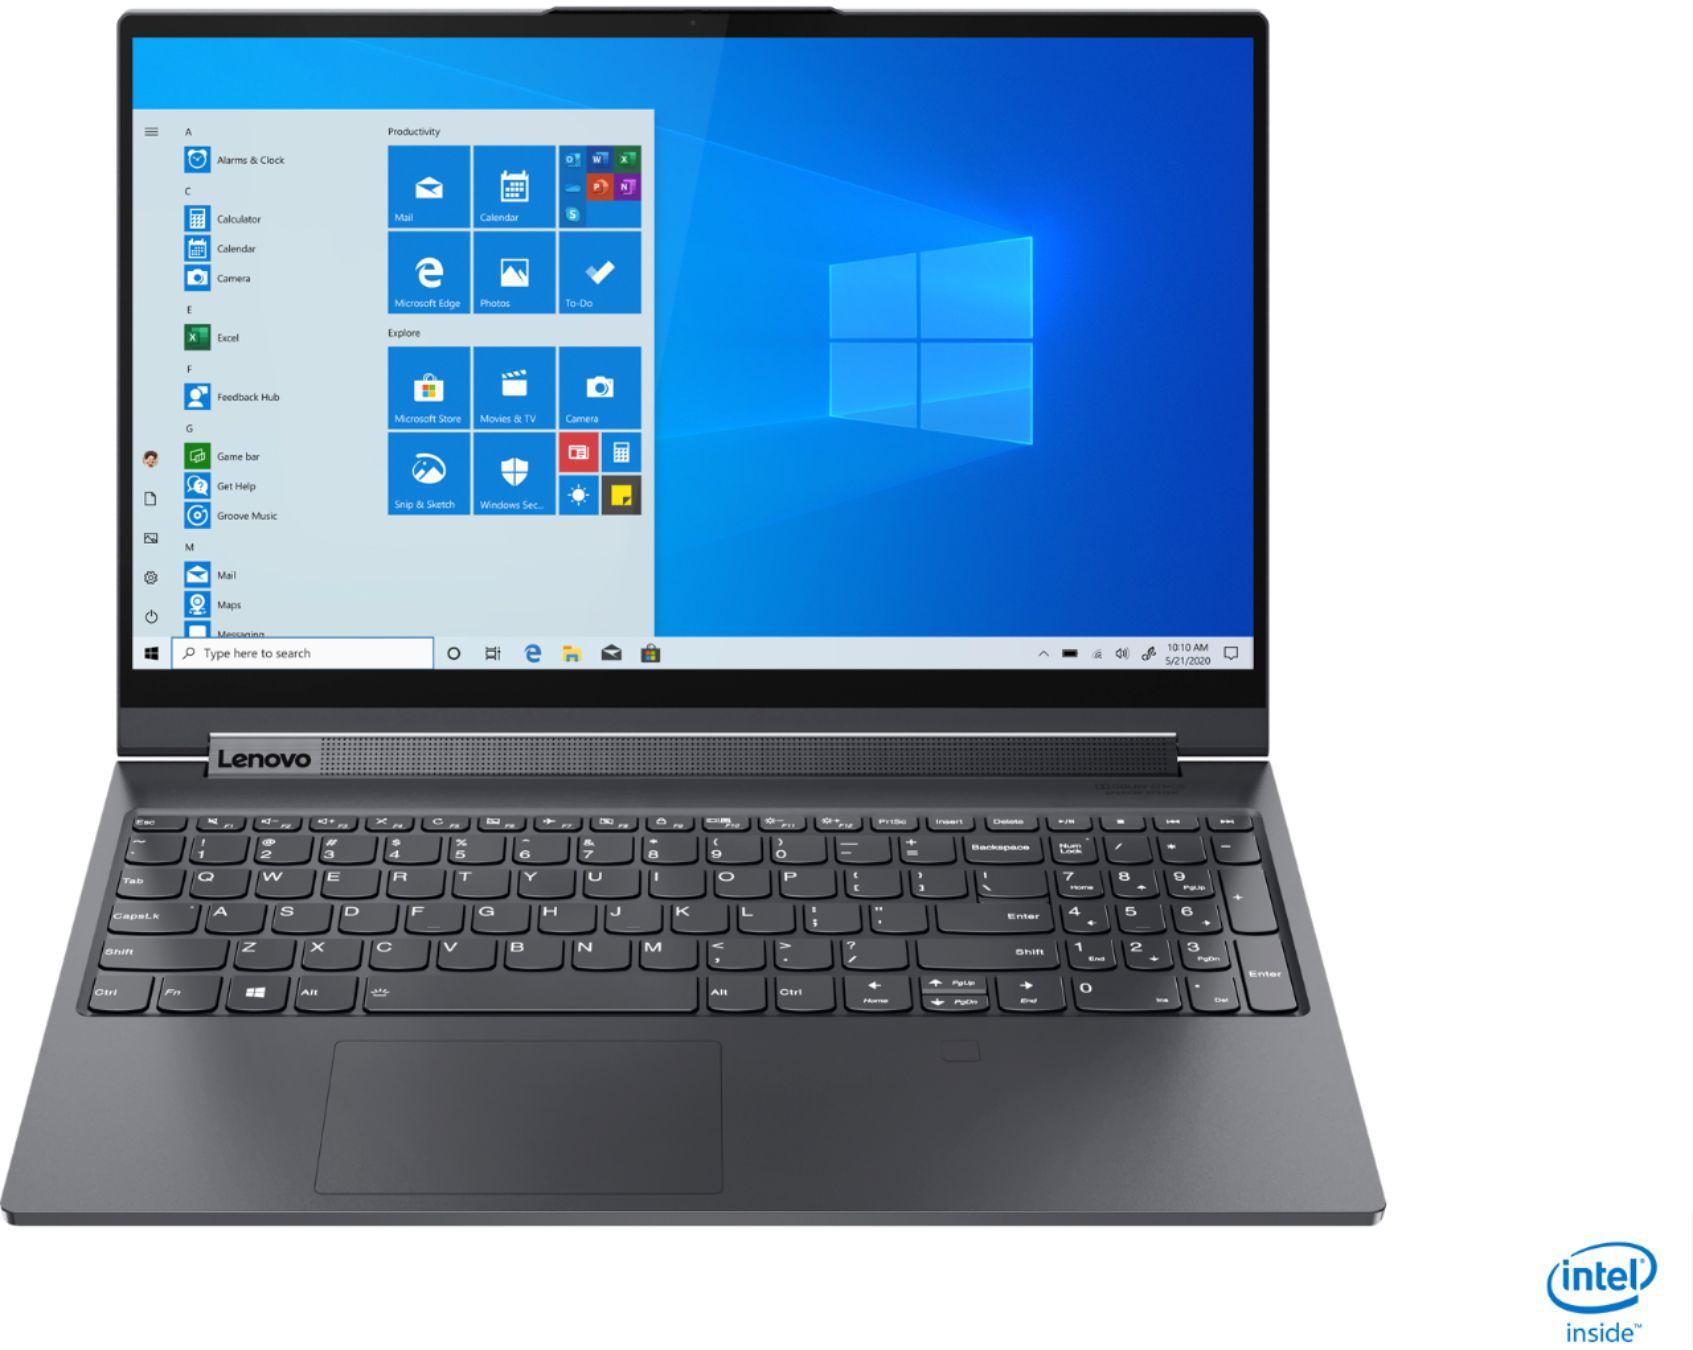 Lenovo Yoga 9i 15-Inch